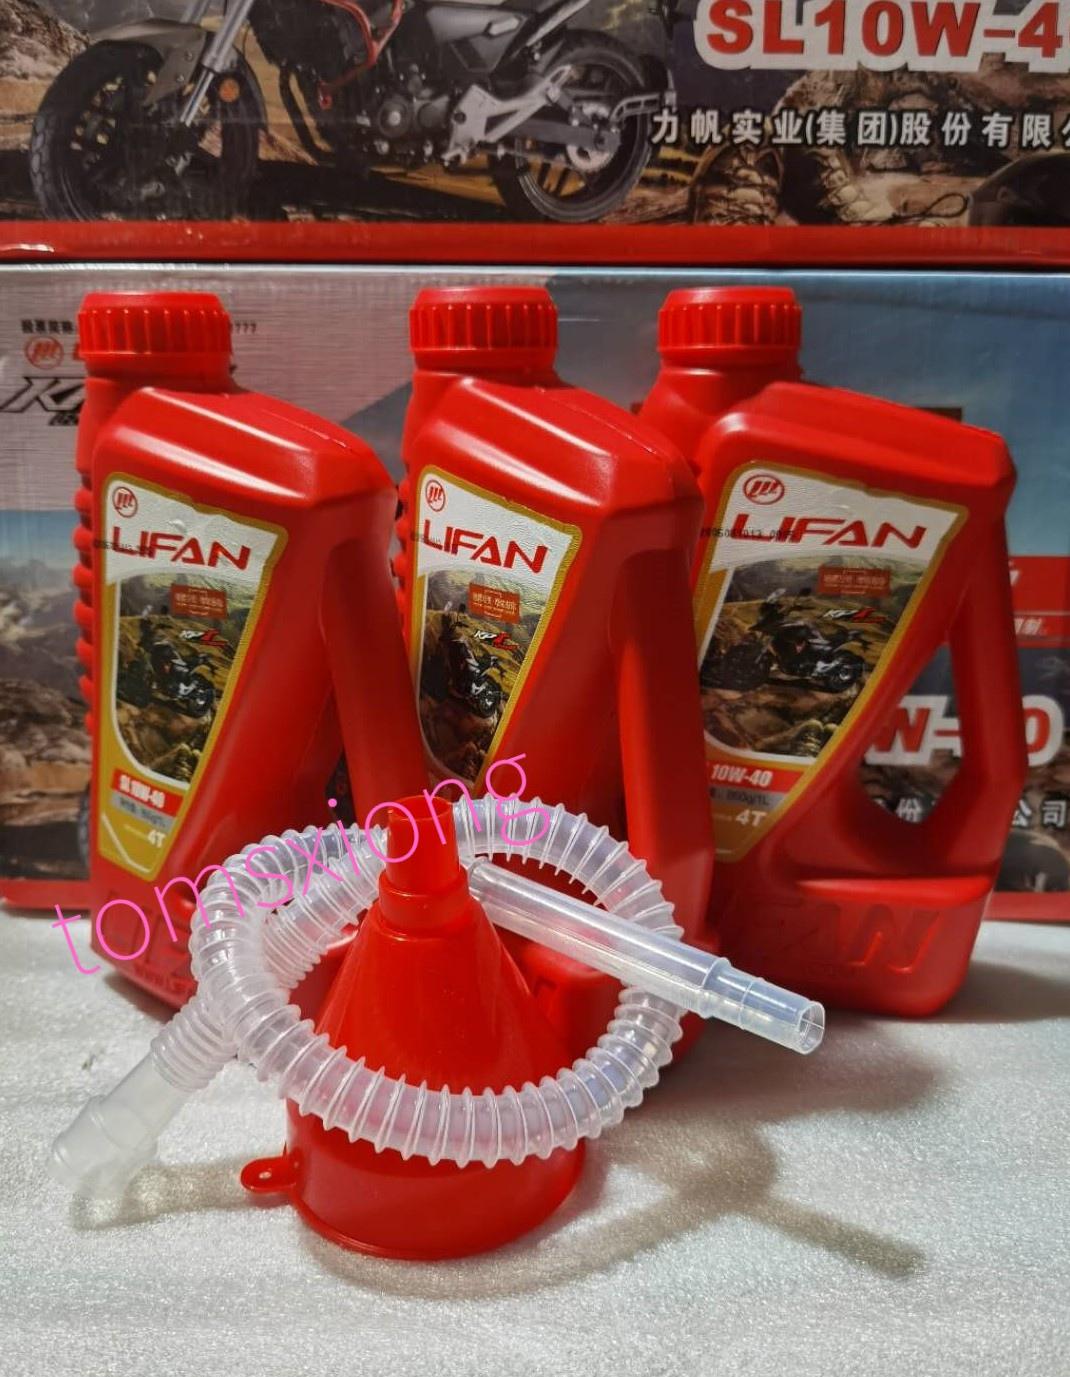 Lifan KPT200KPMKP150KPV150KPR150150-10S oil high-quality semi-synthetic oil